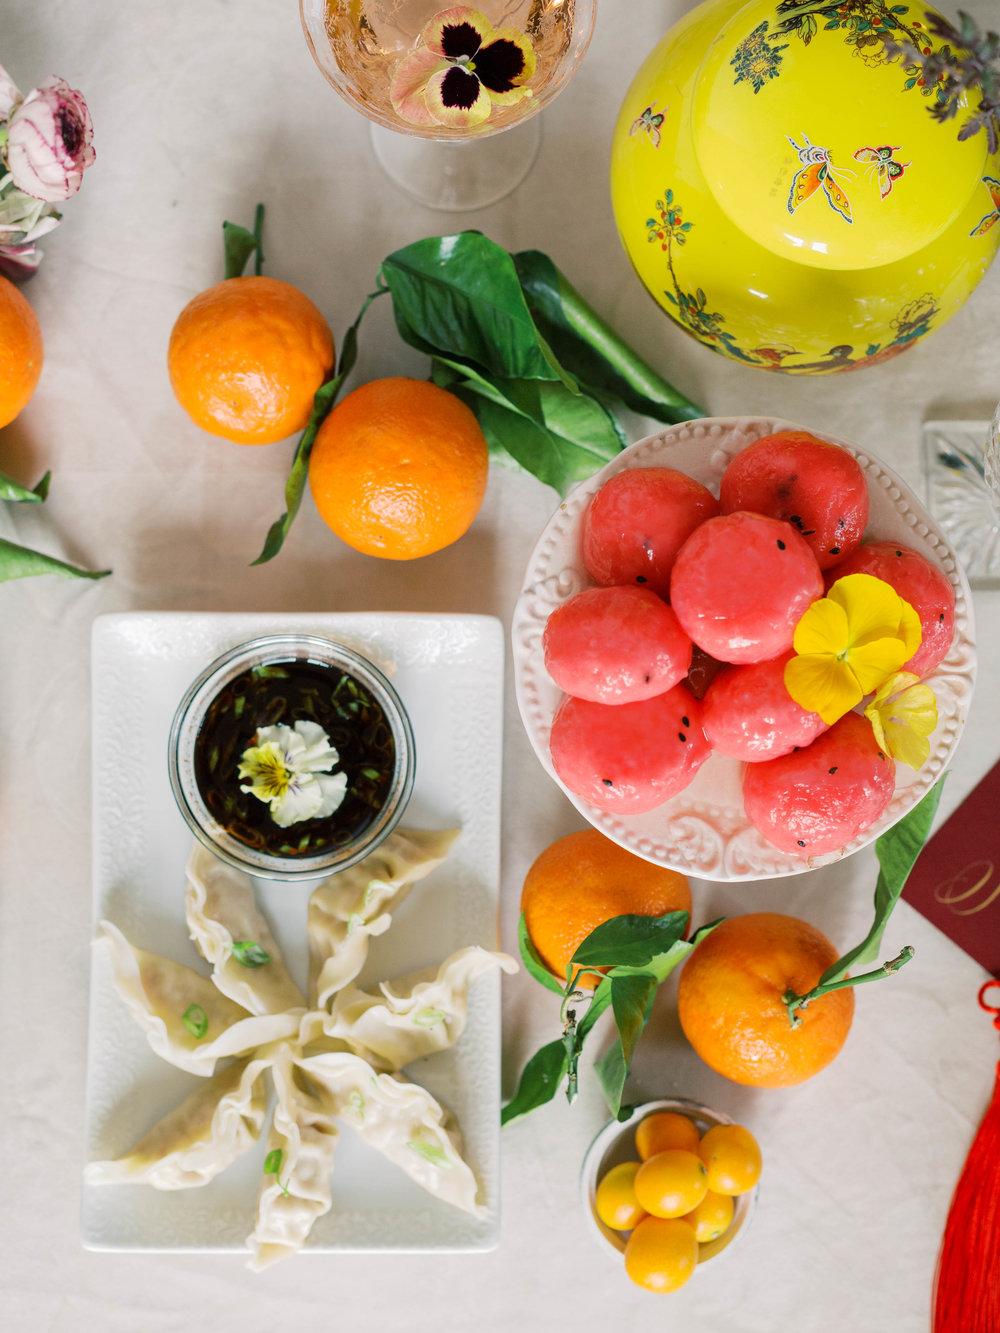 Carlos-Hernandez-Wedding-Film-Photography-Chinese-Year-Celebration-With-Joy-Proctor-051.jpg